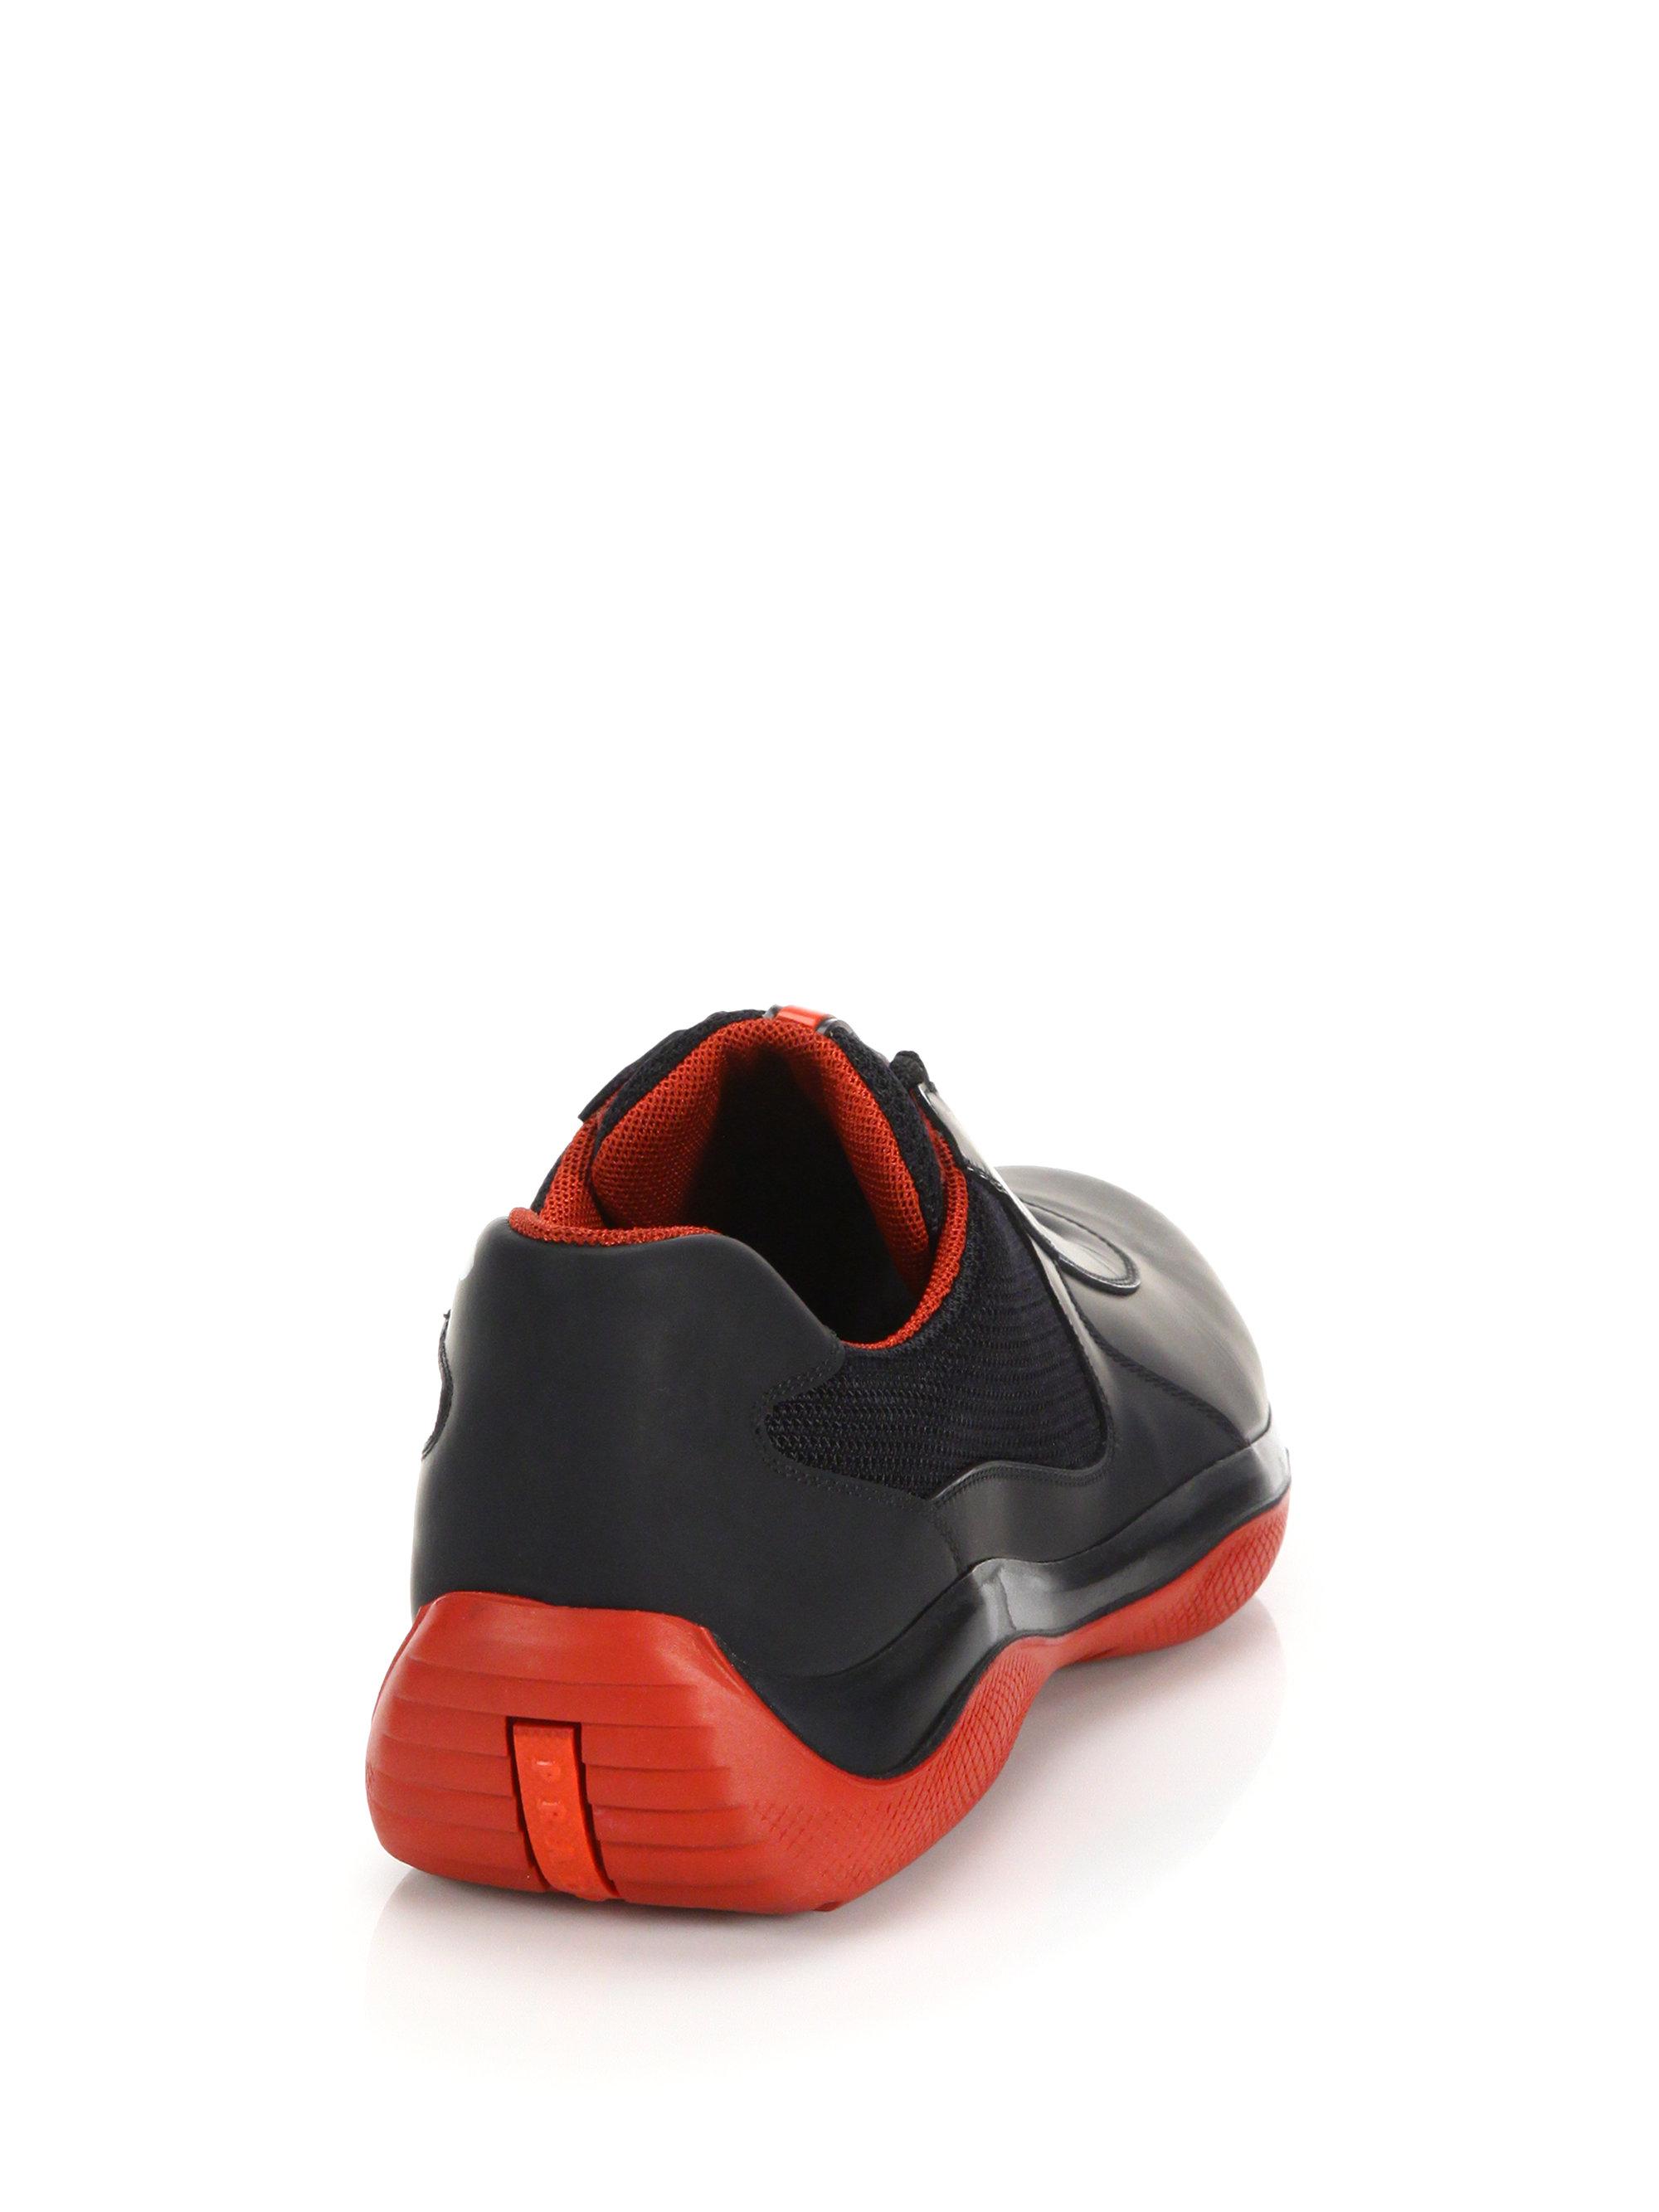 d59ecdd8 where can i buy prada sneakers orange red 27087 6ff19